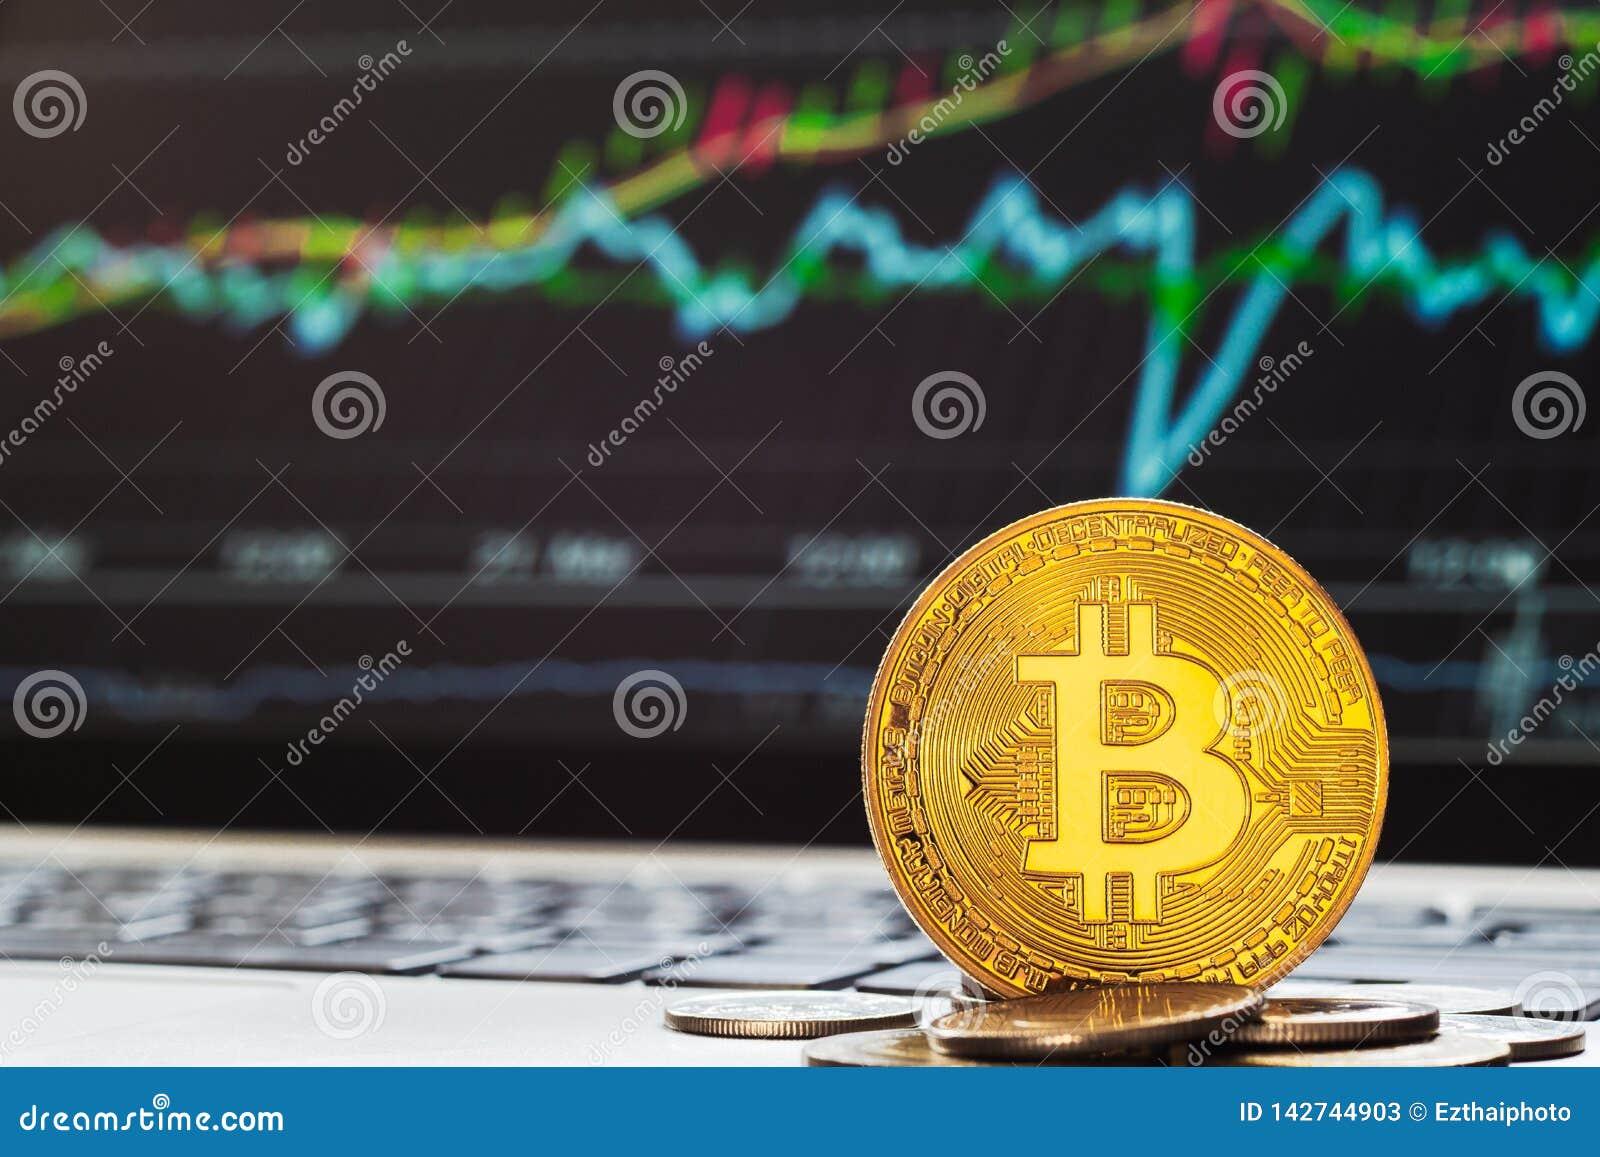 dupla bitcoin script bitcoin freedom system